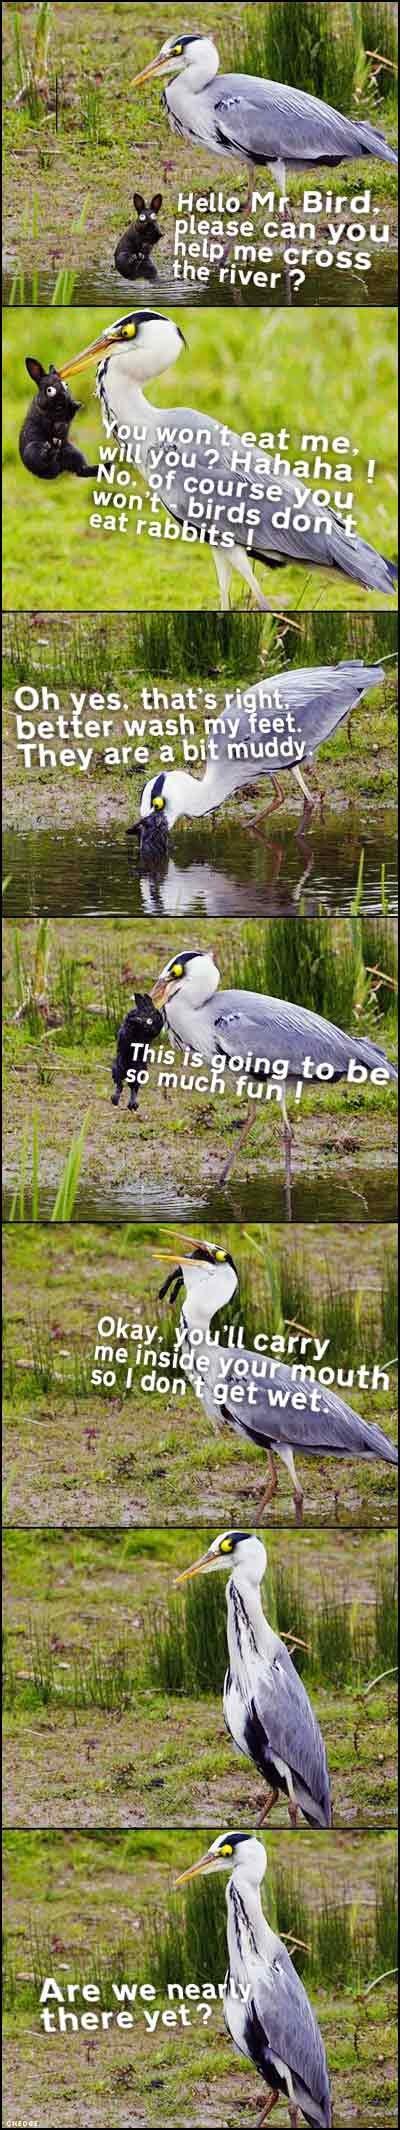 heron bunny transporter. www.lulzpitbullz.com Aerial installs peterborough Aerial installs whittlesey Aerial installs wisbech Aerial installs march Aerial insta penguins shit in my WHEELIEBIN but Anon Raped kitteh for da lulz luluQ stole Underwear sniffing